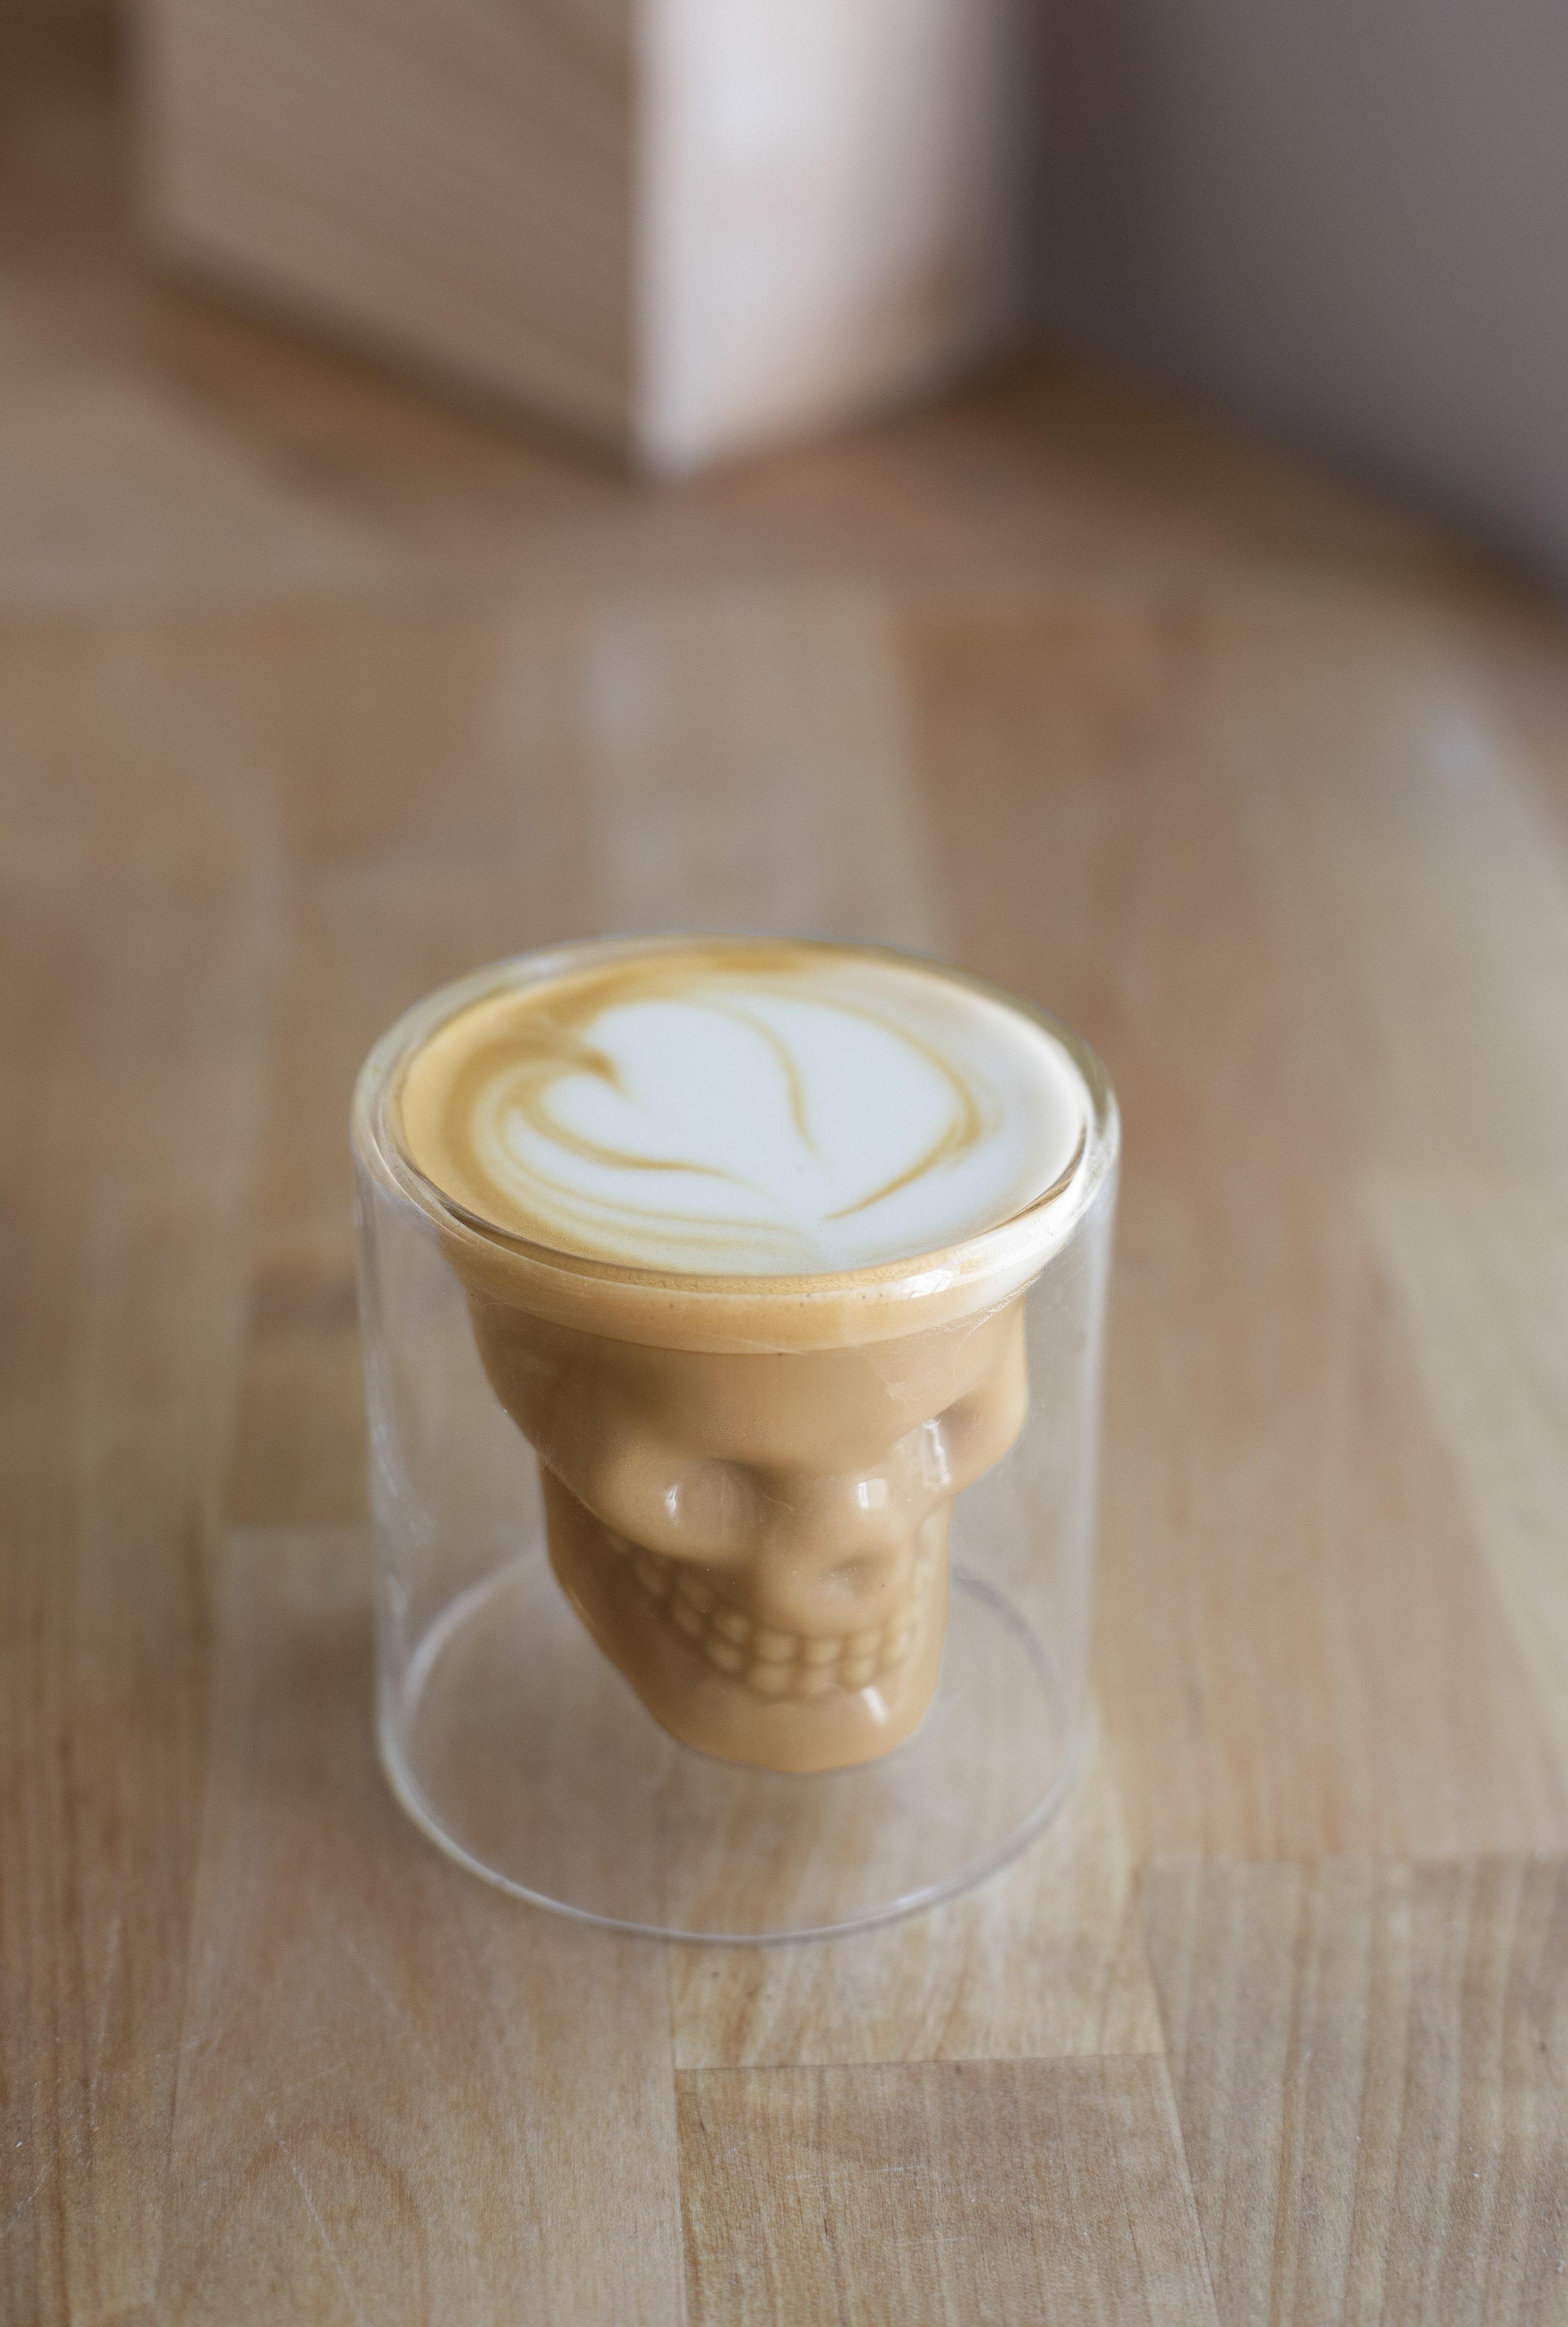 Coffee from SlowMov at Eat My Trip, Barcelona